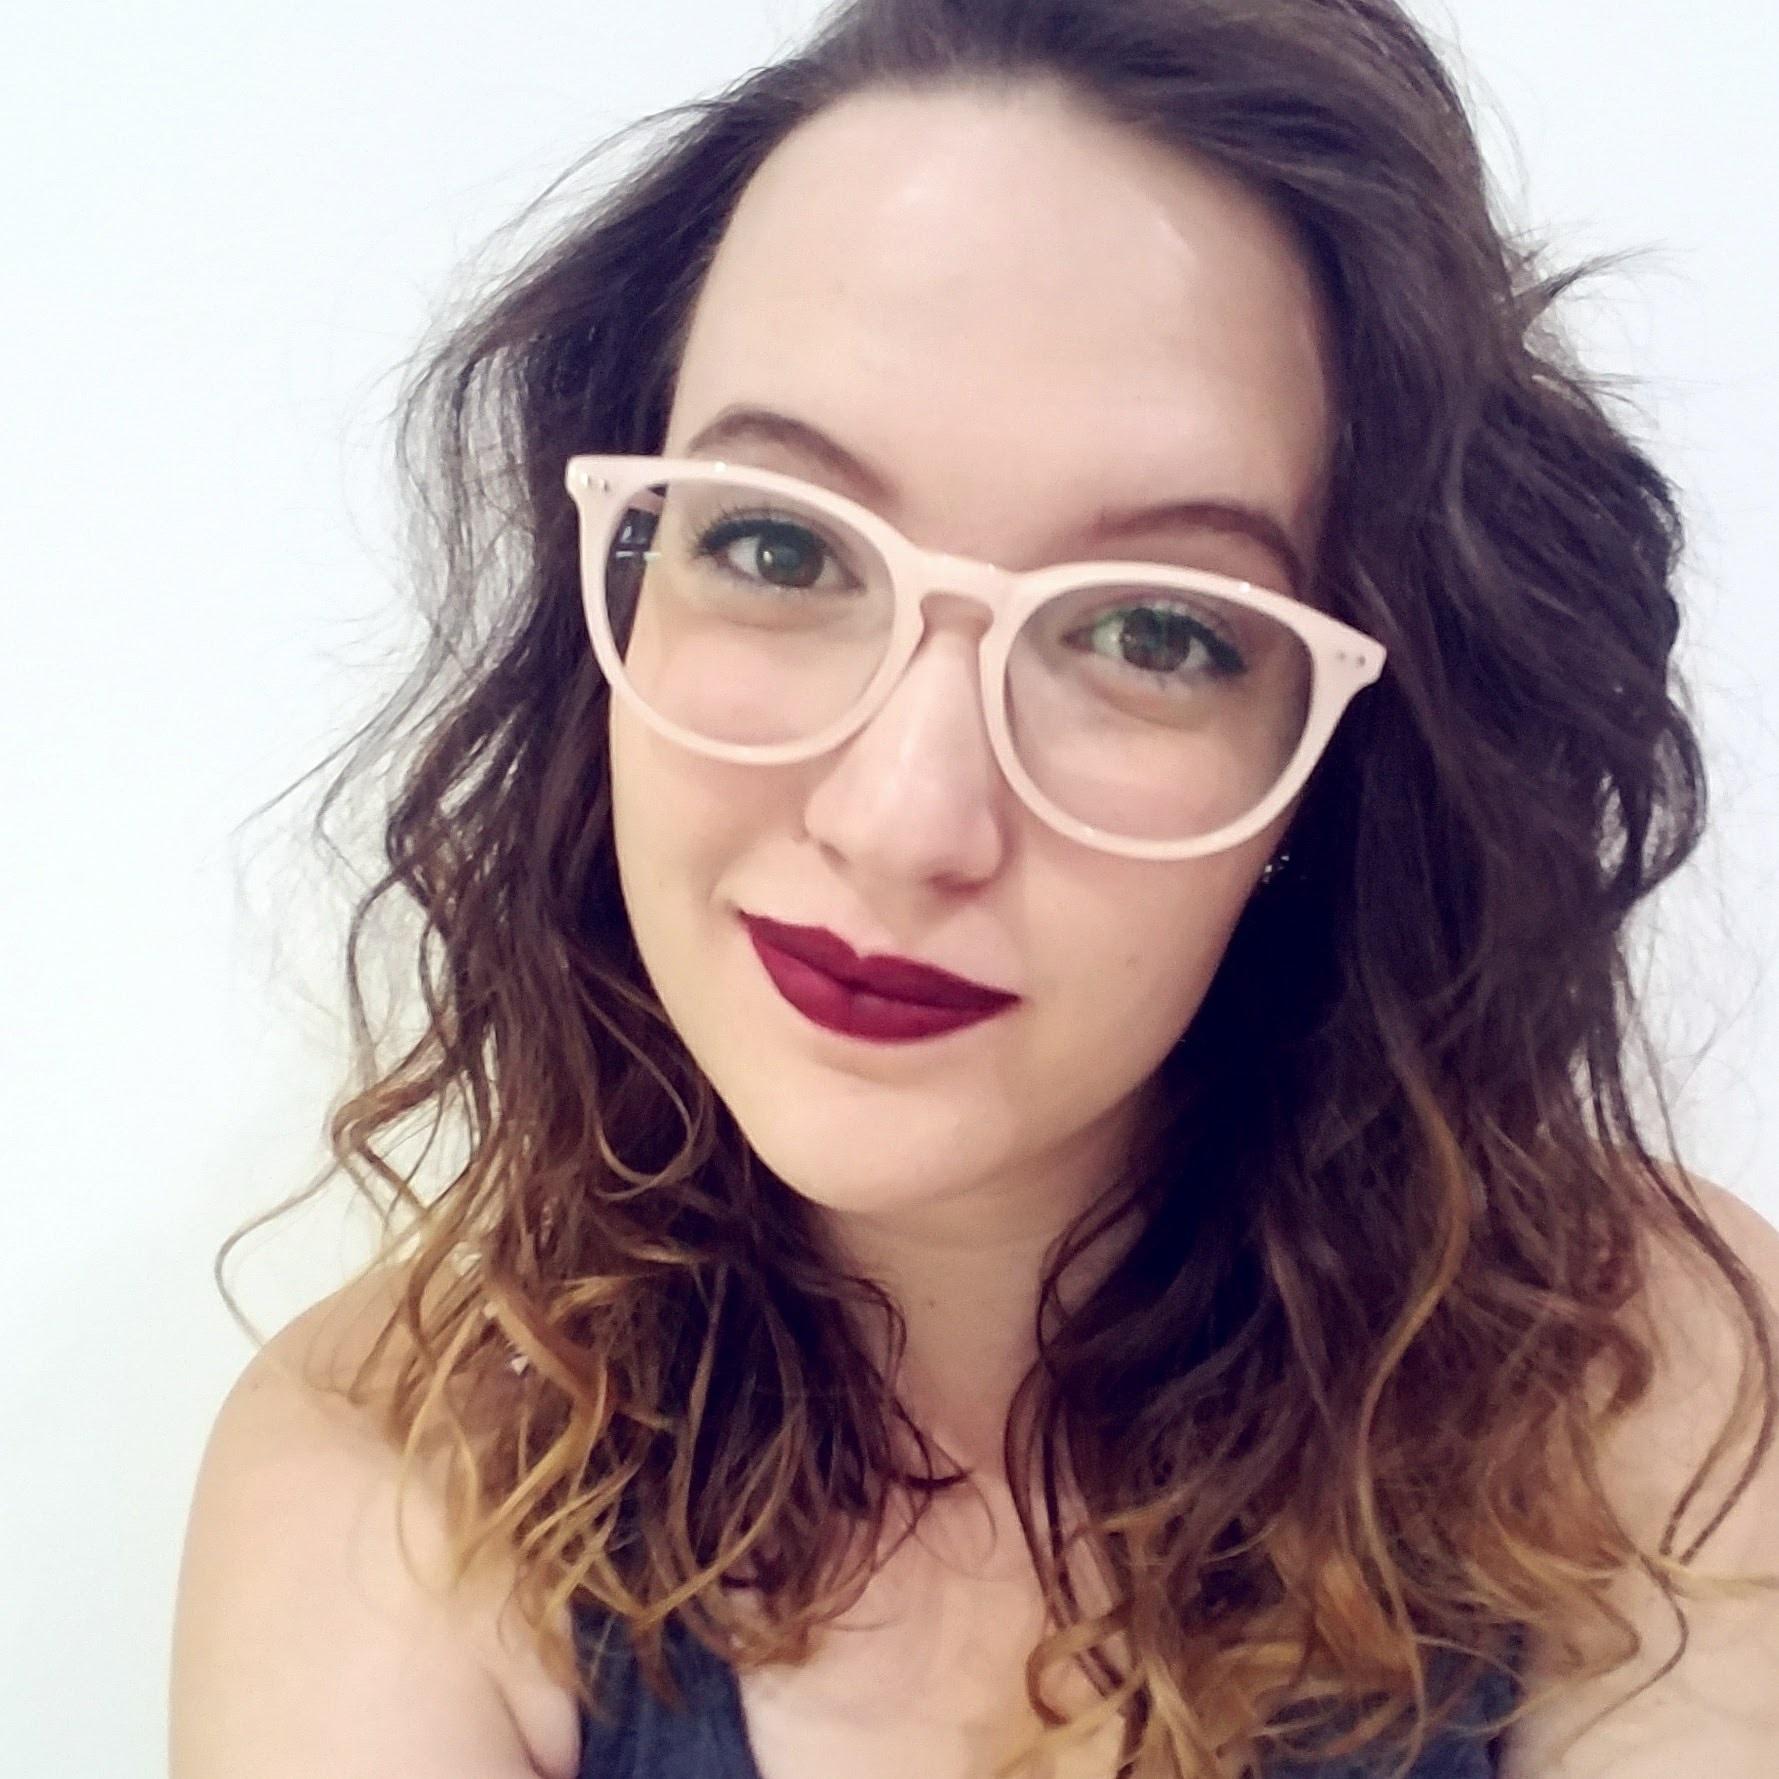 Go to Haley Carmichael's profile